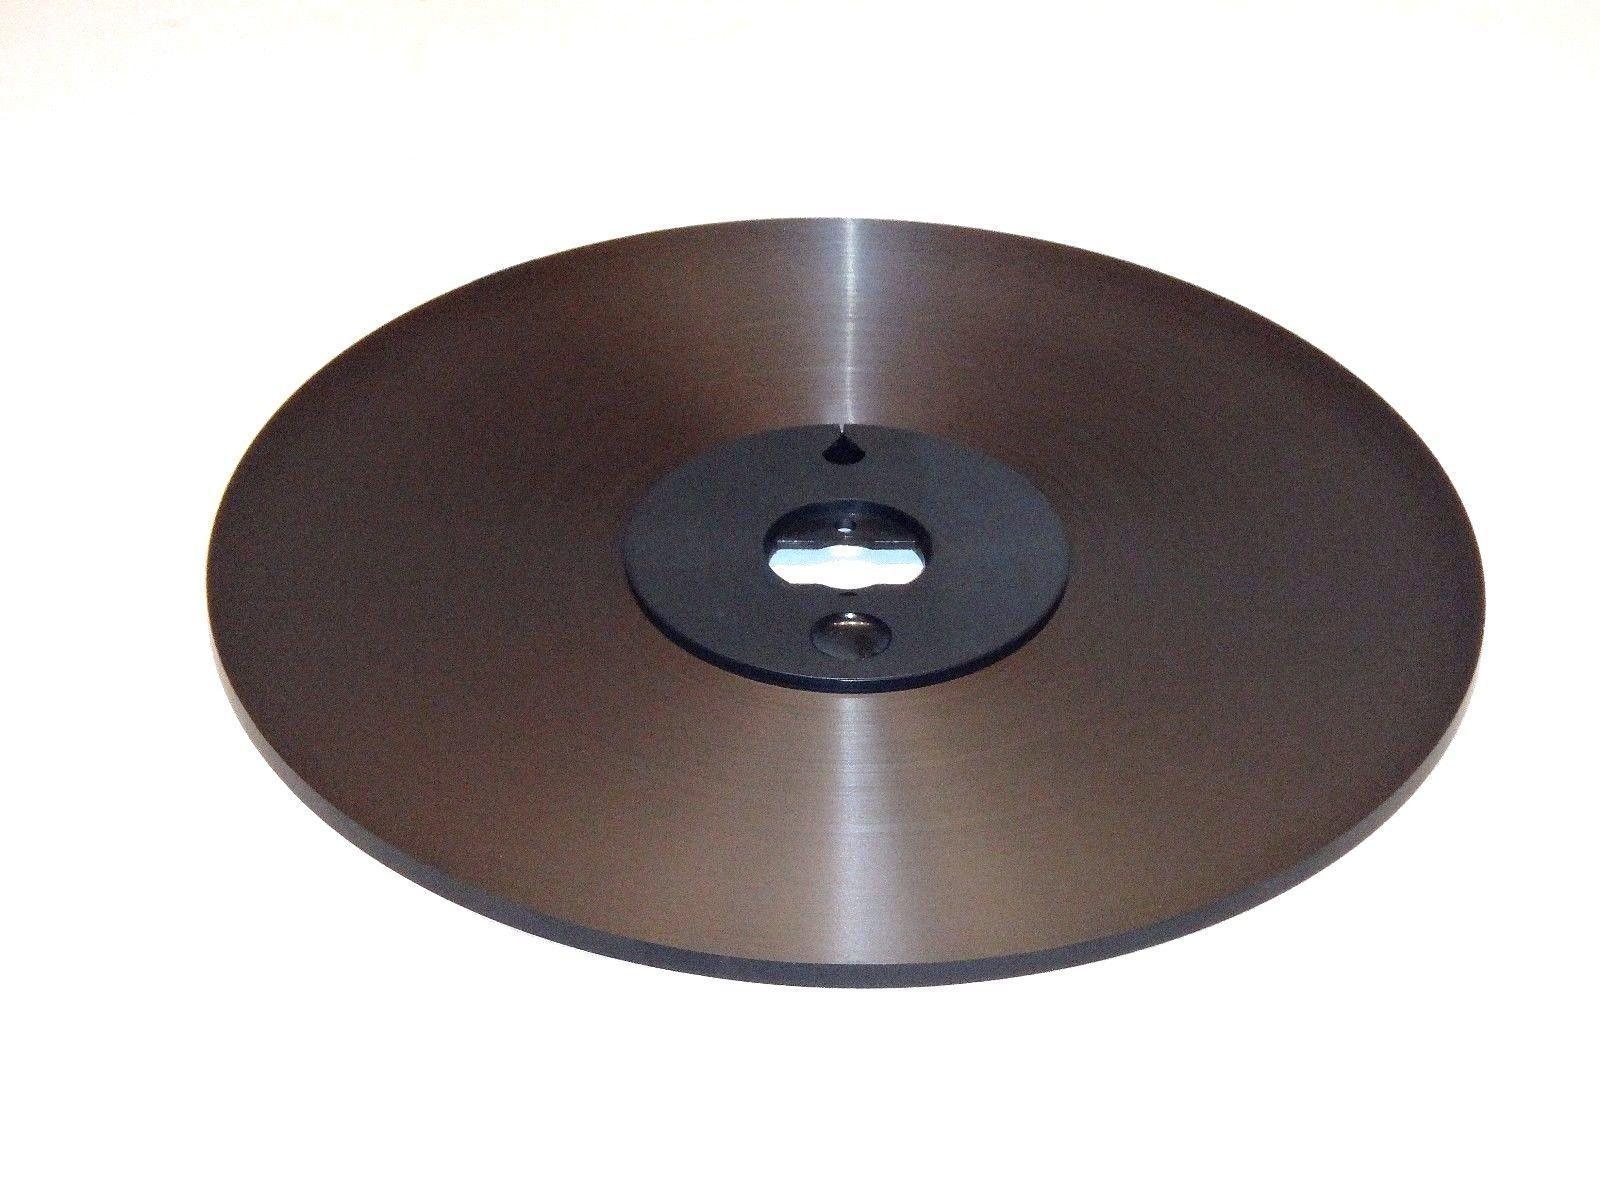 "RTM SM900 BASF Reel Tape PANCAKE AEG hub 1/4"" 3608ft 1100m Authorized Dealer"